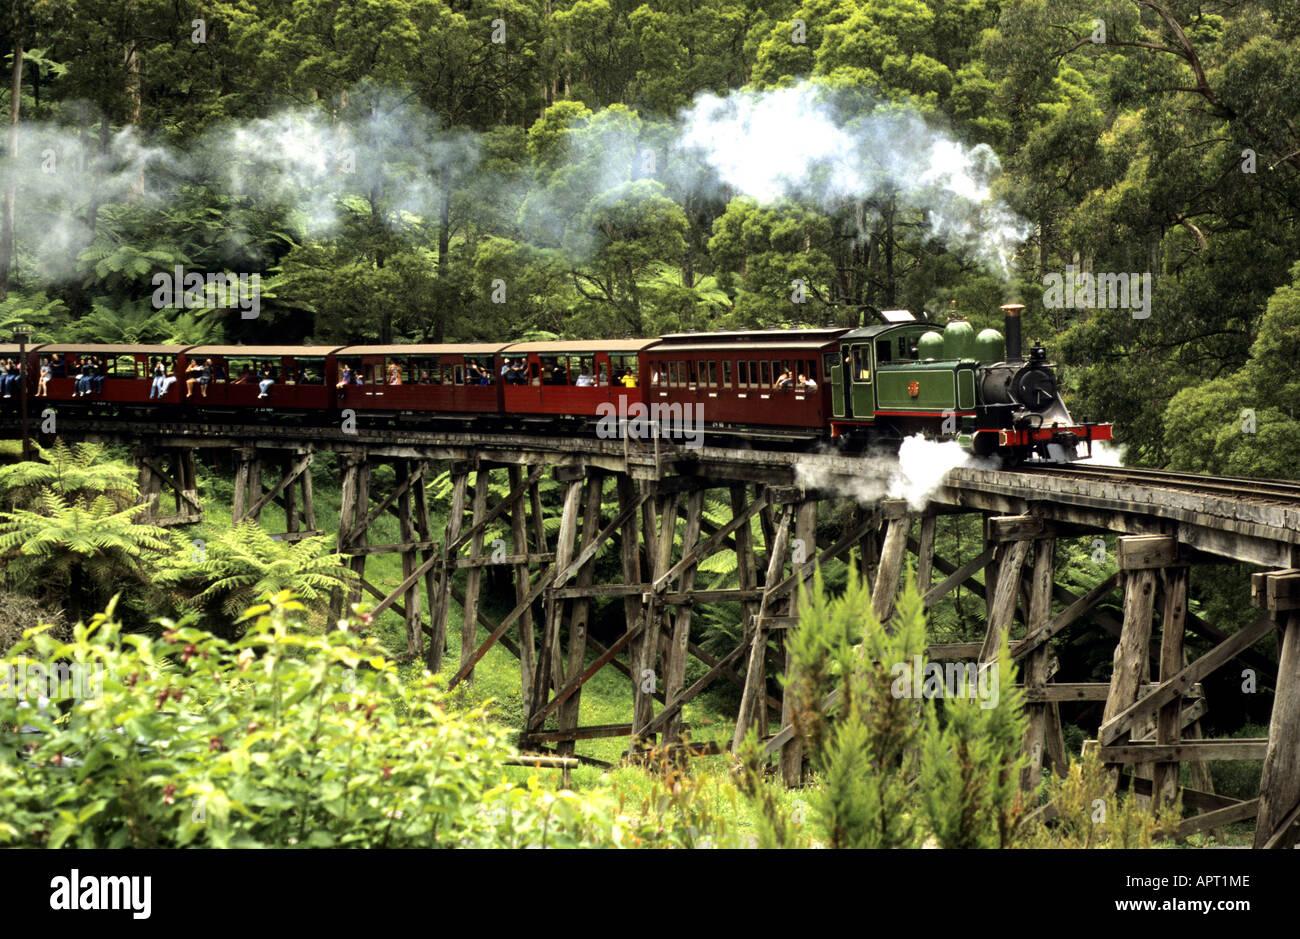 Steam train on Puffing Billy Railway, Belgrave, Victoria, Australia - Stock Image